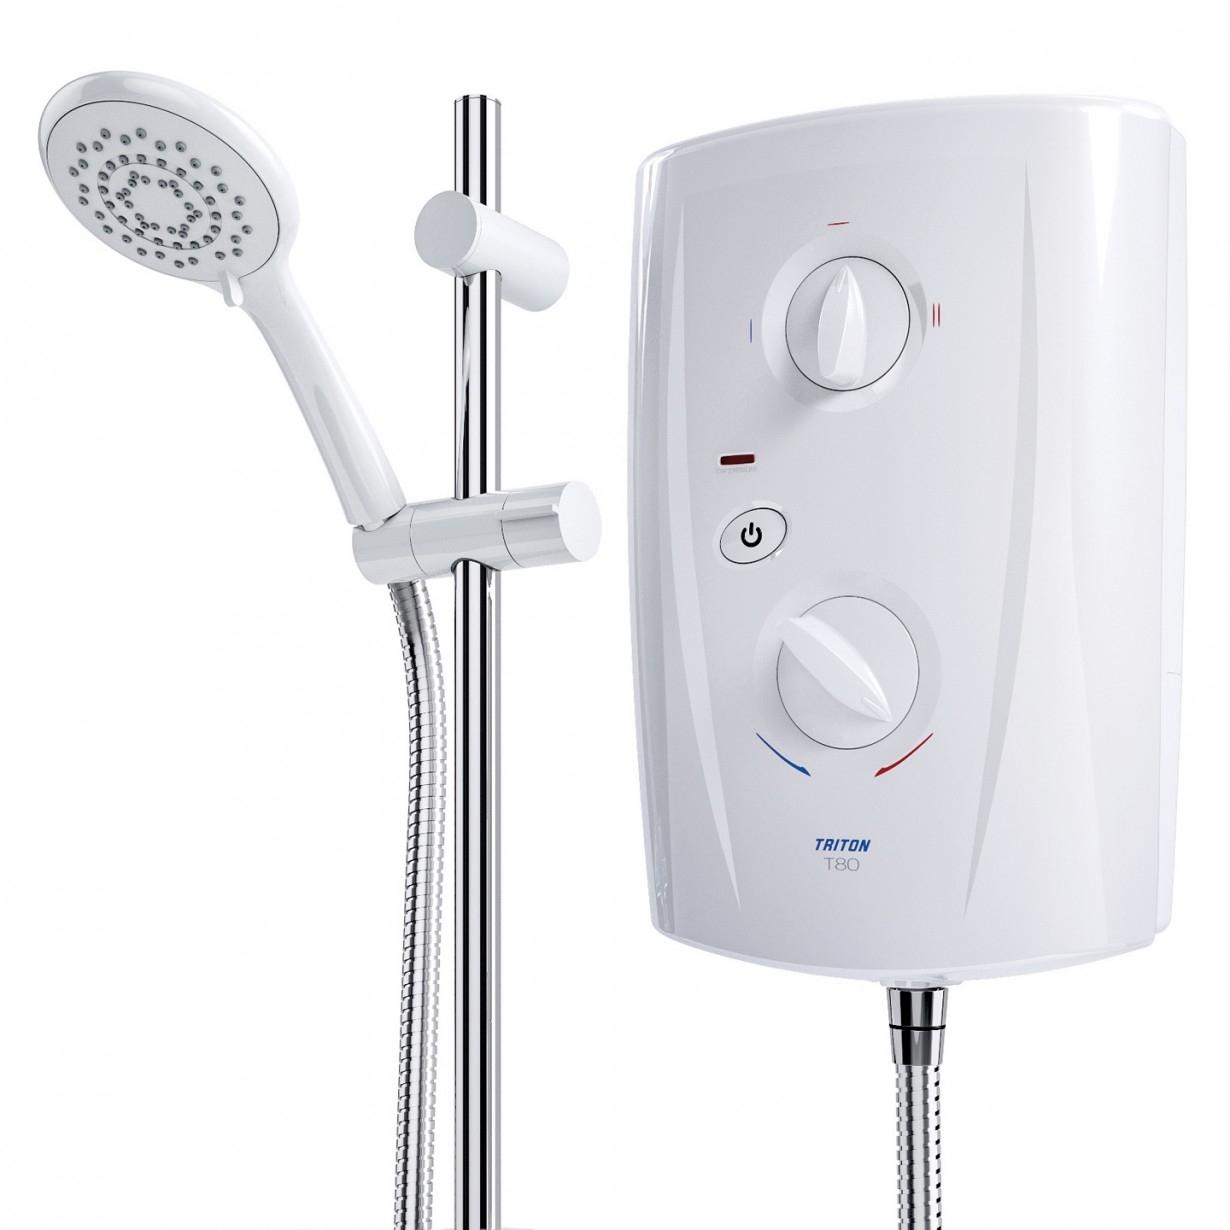 Triton T80 Pro-Fit Electric Shower 9.5KW - White